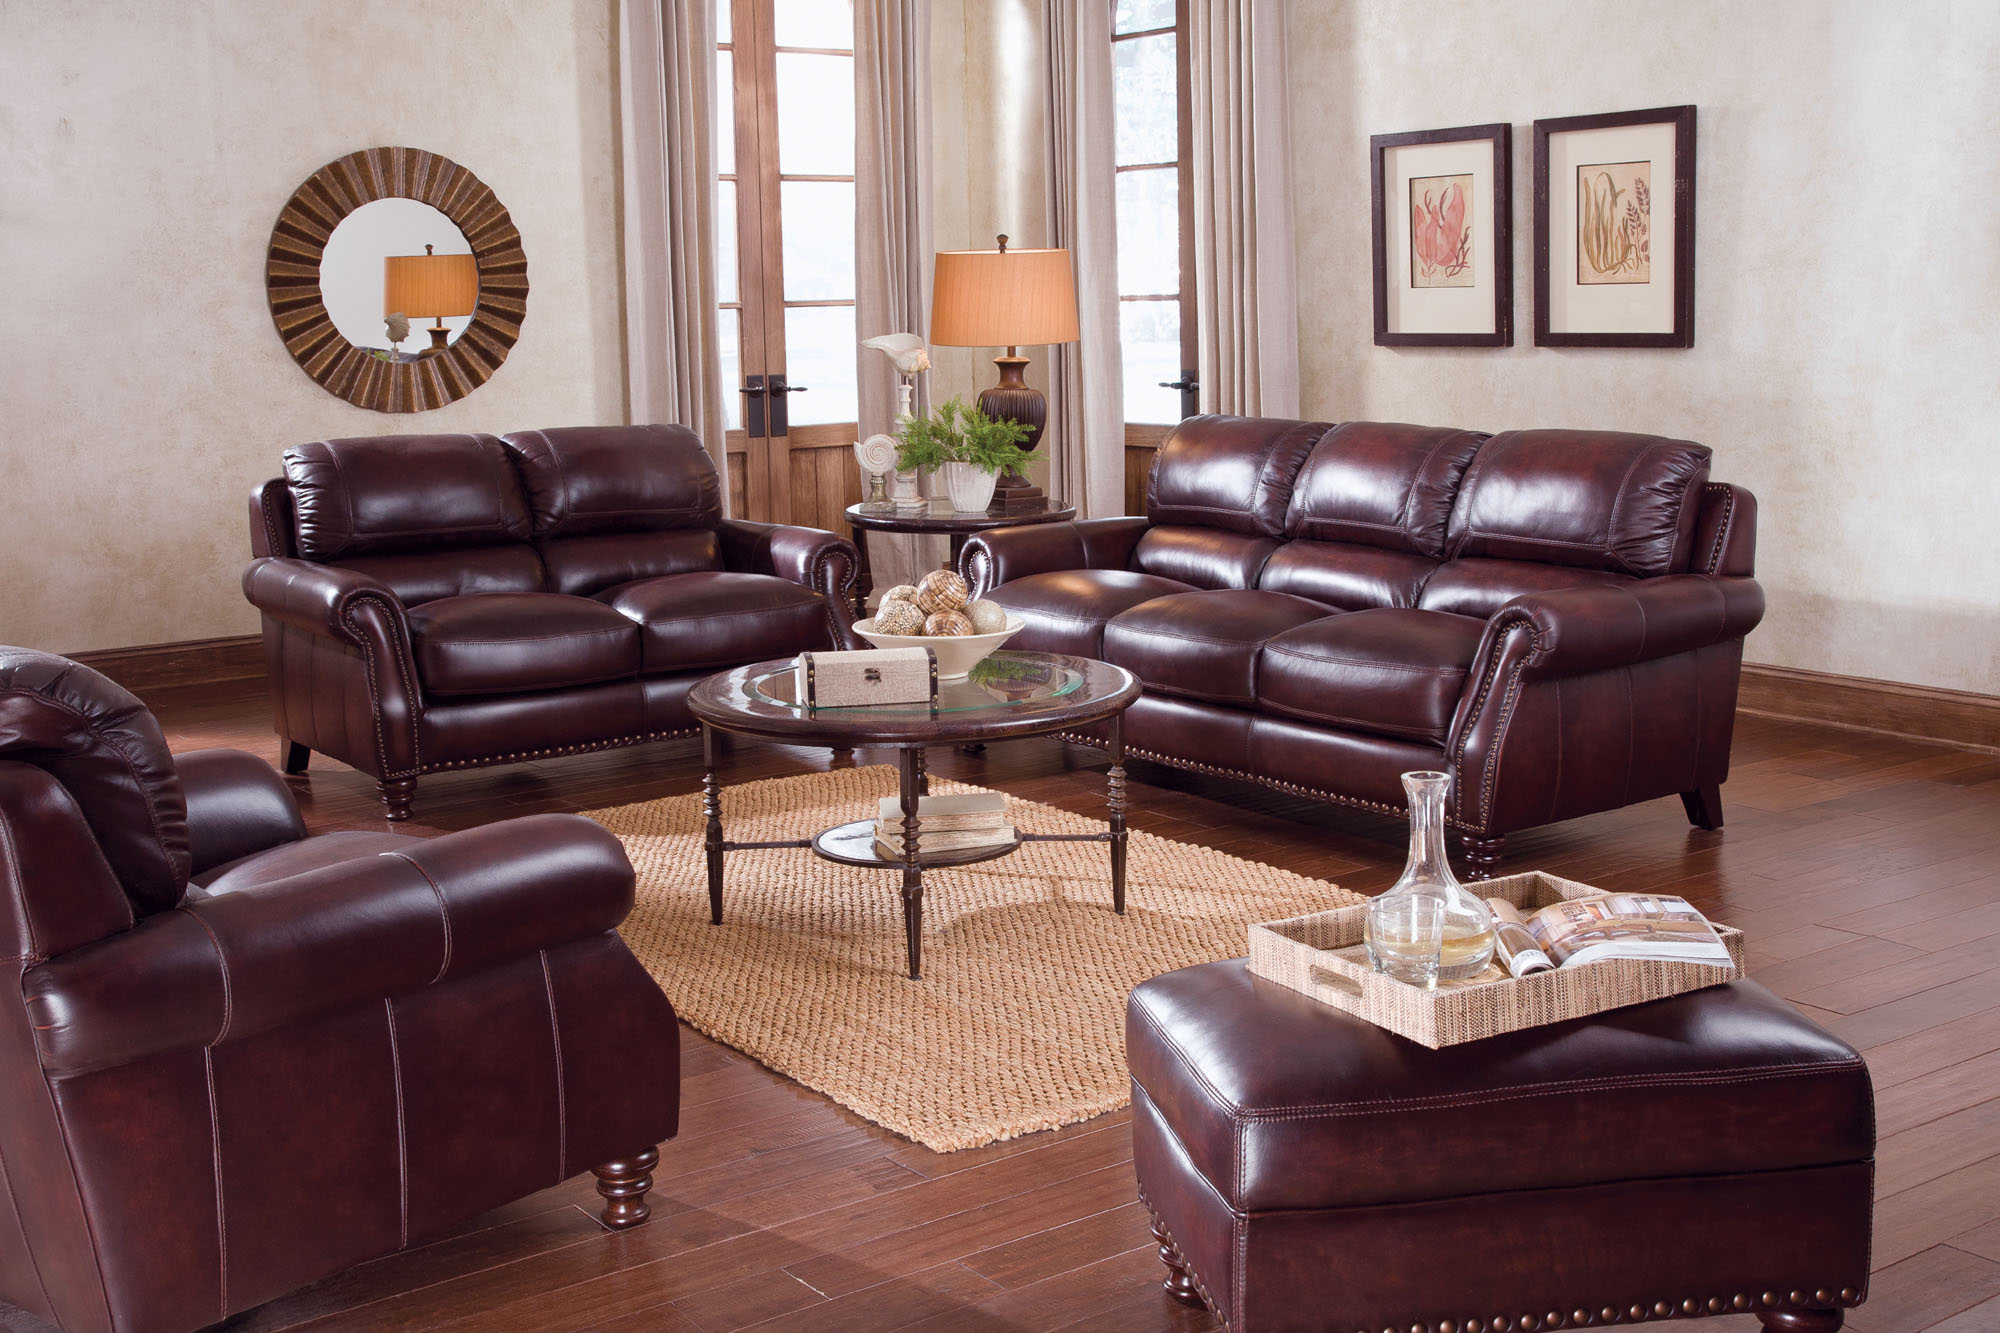 Prescott Sofa Simon Li Furniture Home Gallery Stores